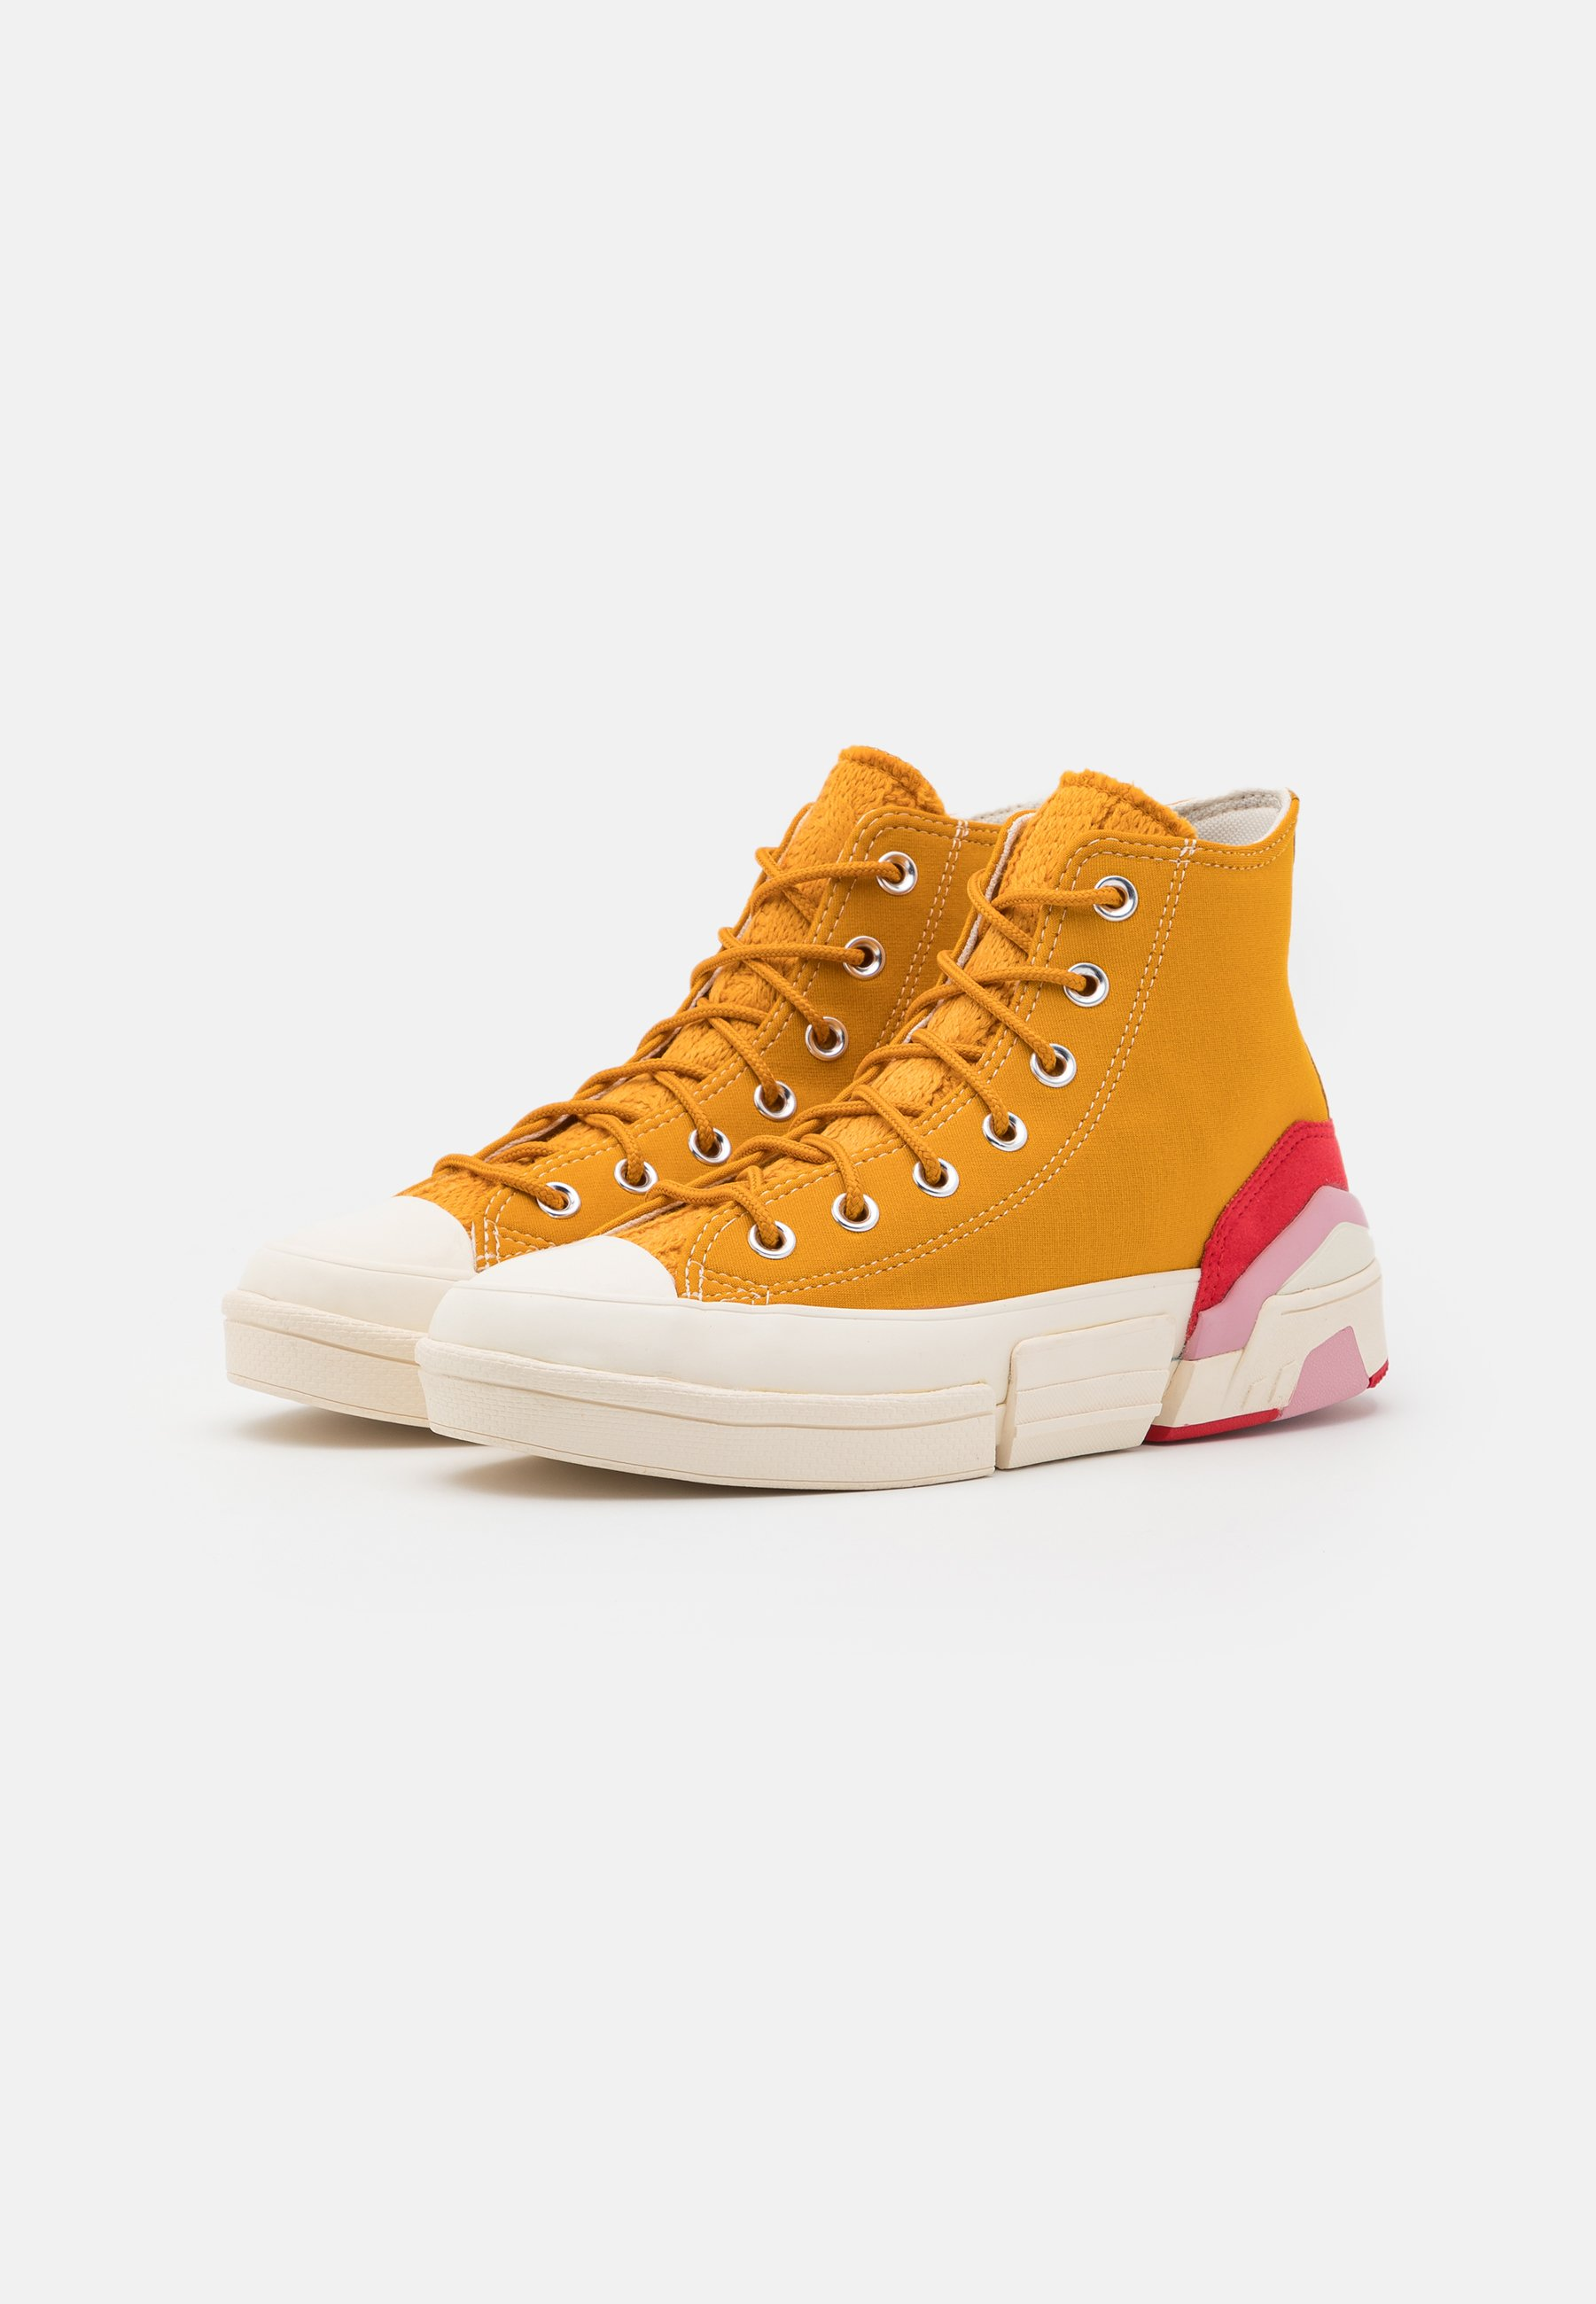 converse cpx70 jaune